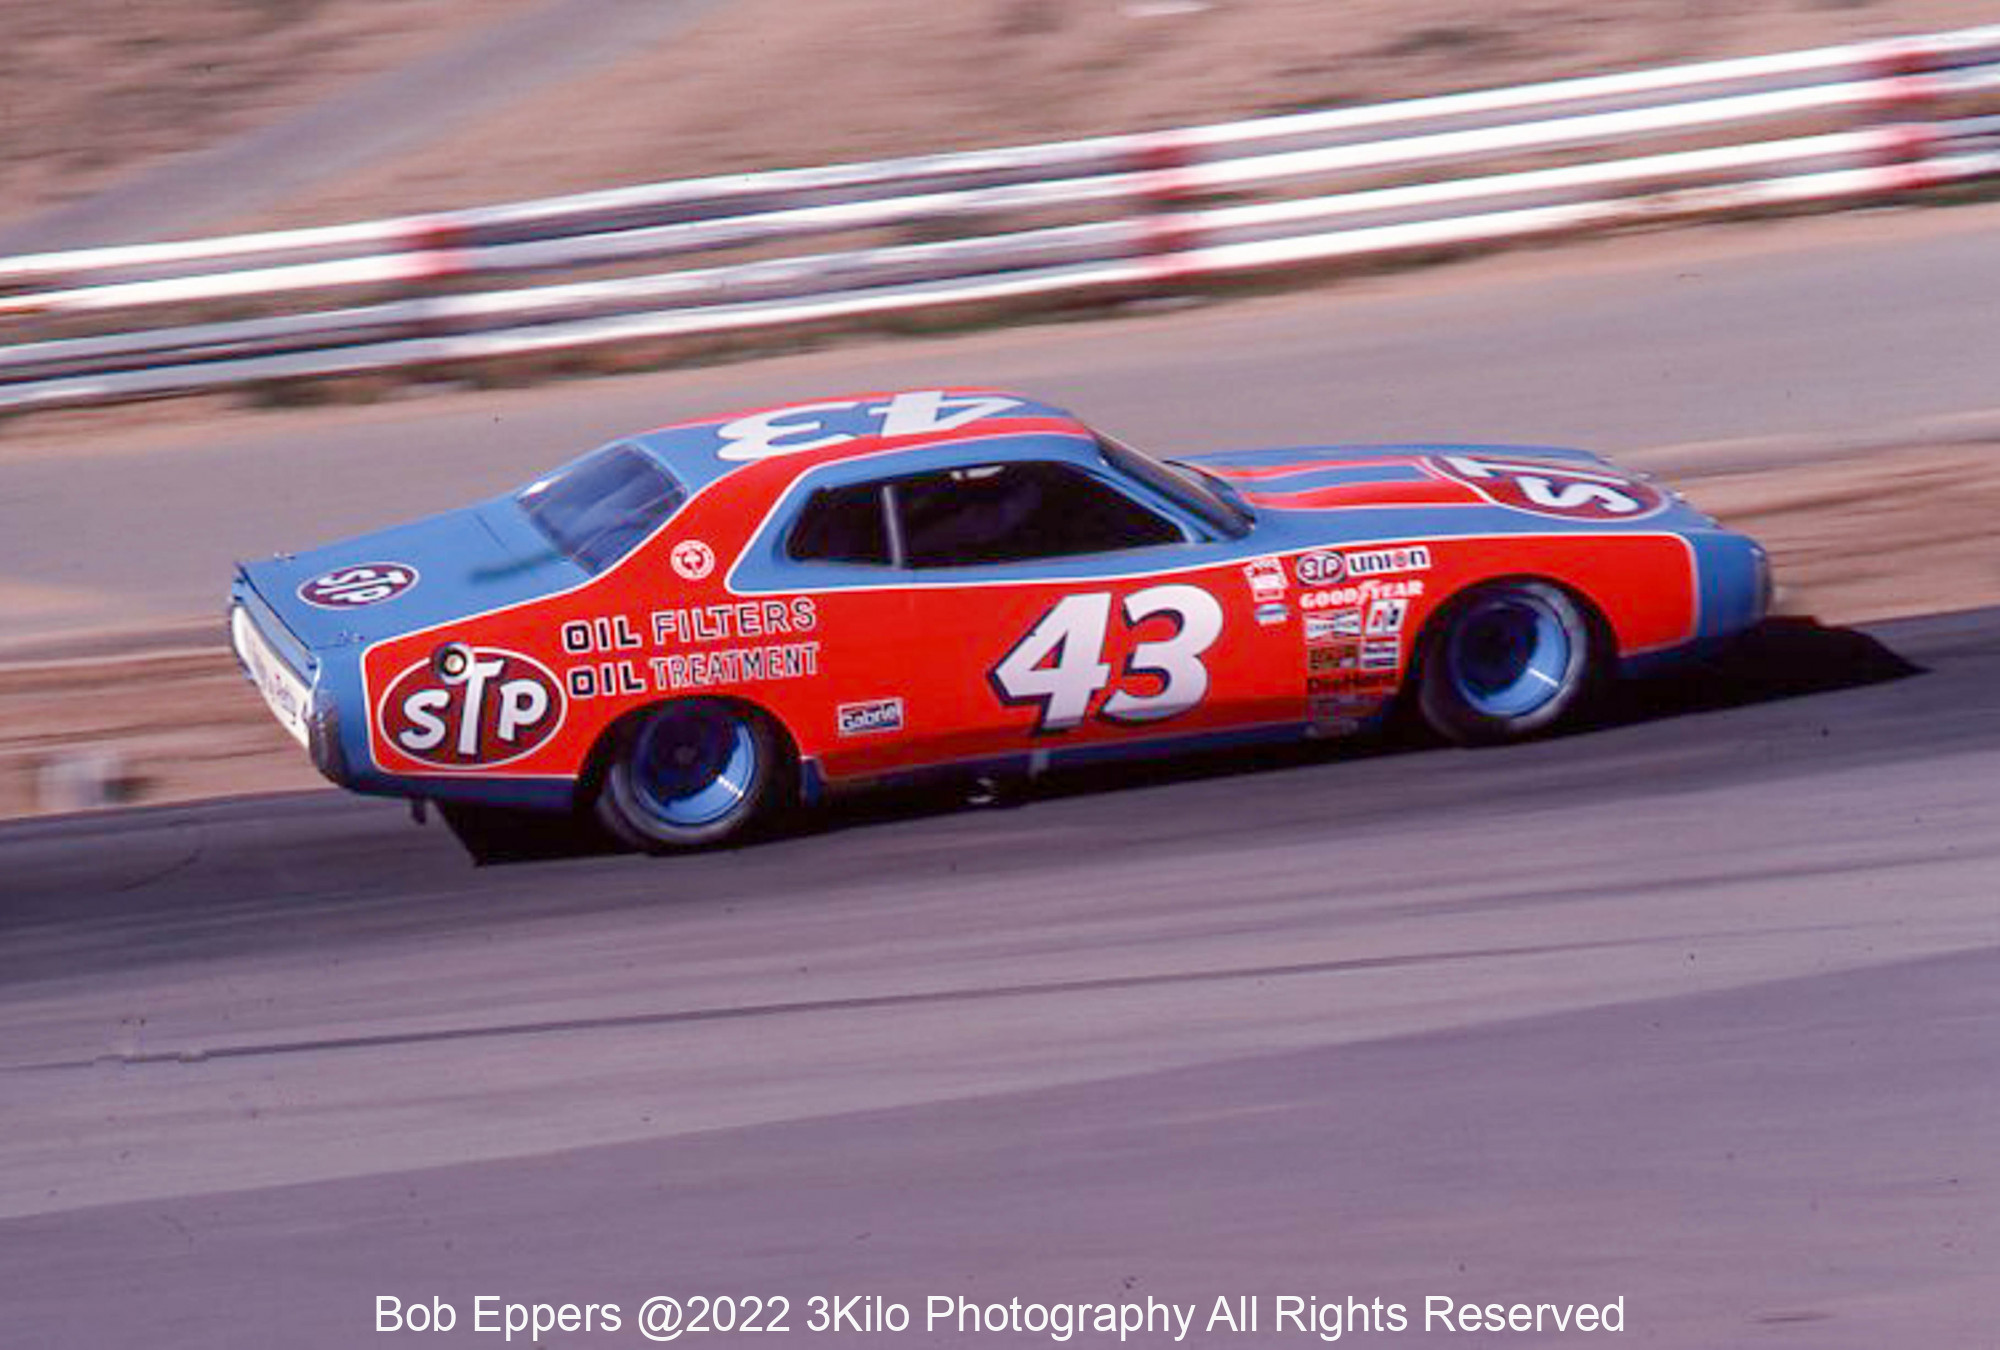 Photo of a NASCAR race at Riverside, CA